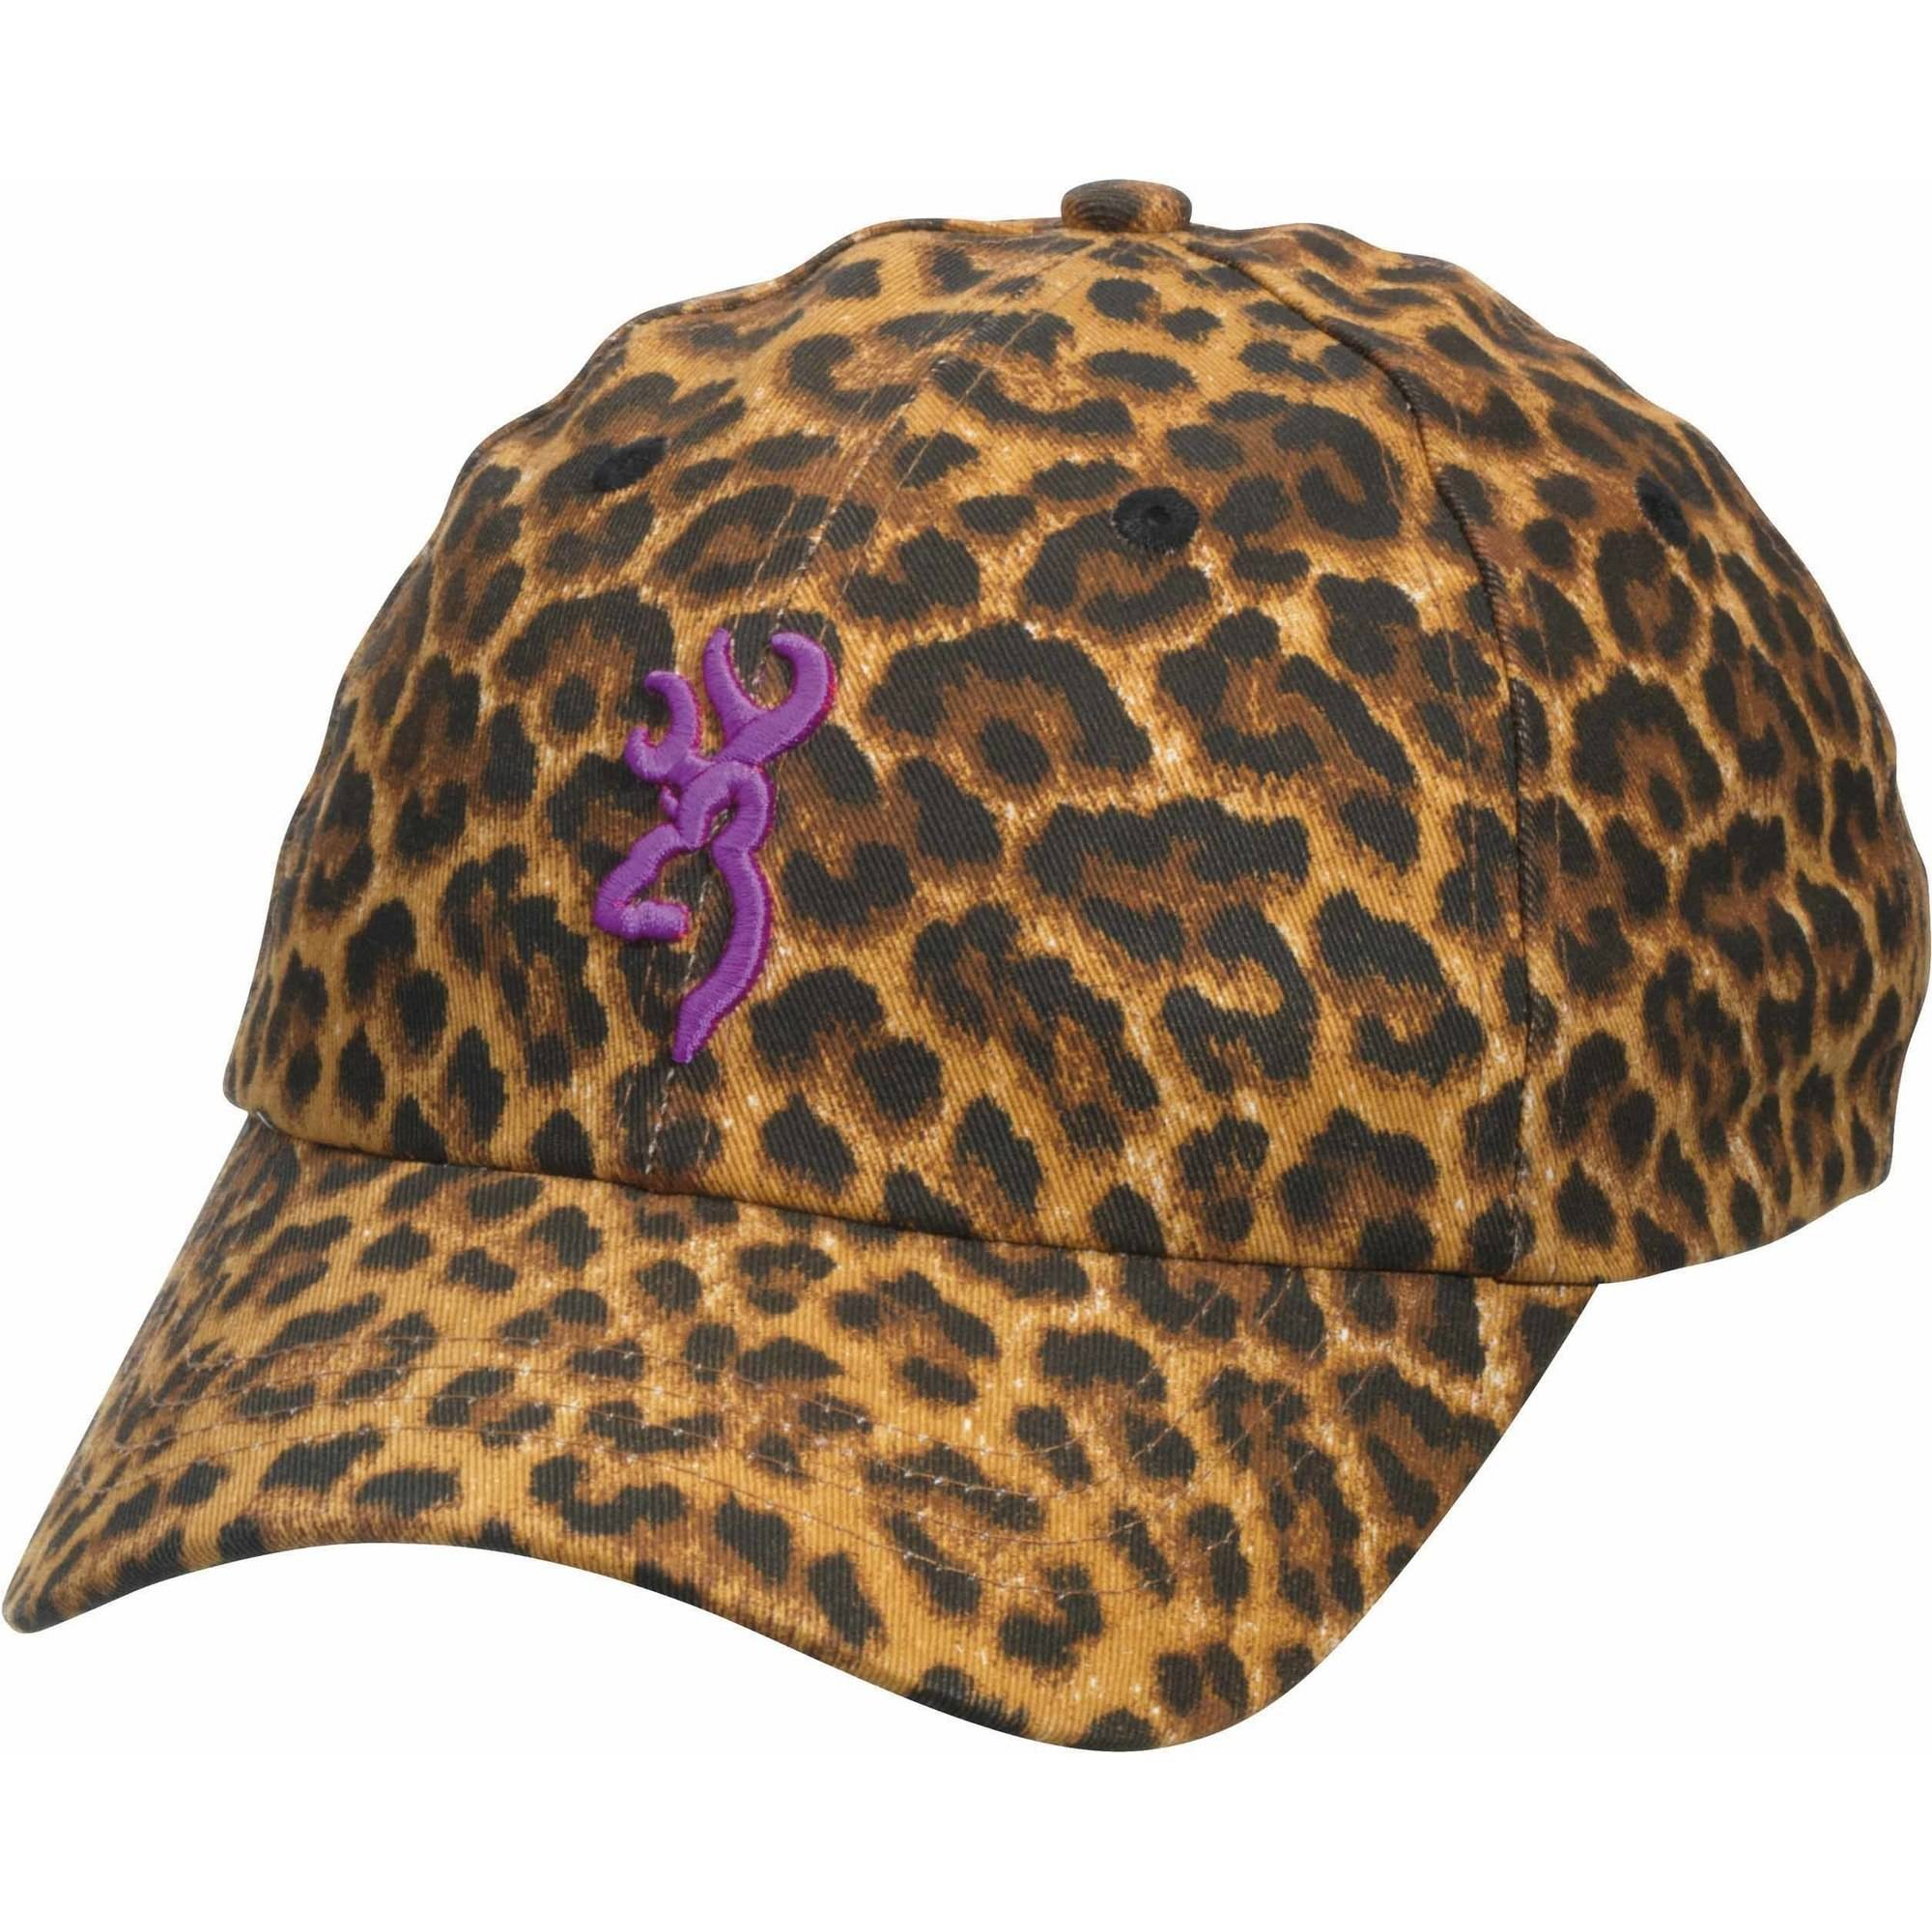 104806 Browning Sahara Leopard/Purple Cap